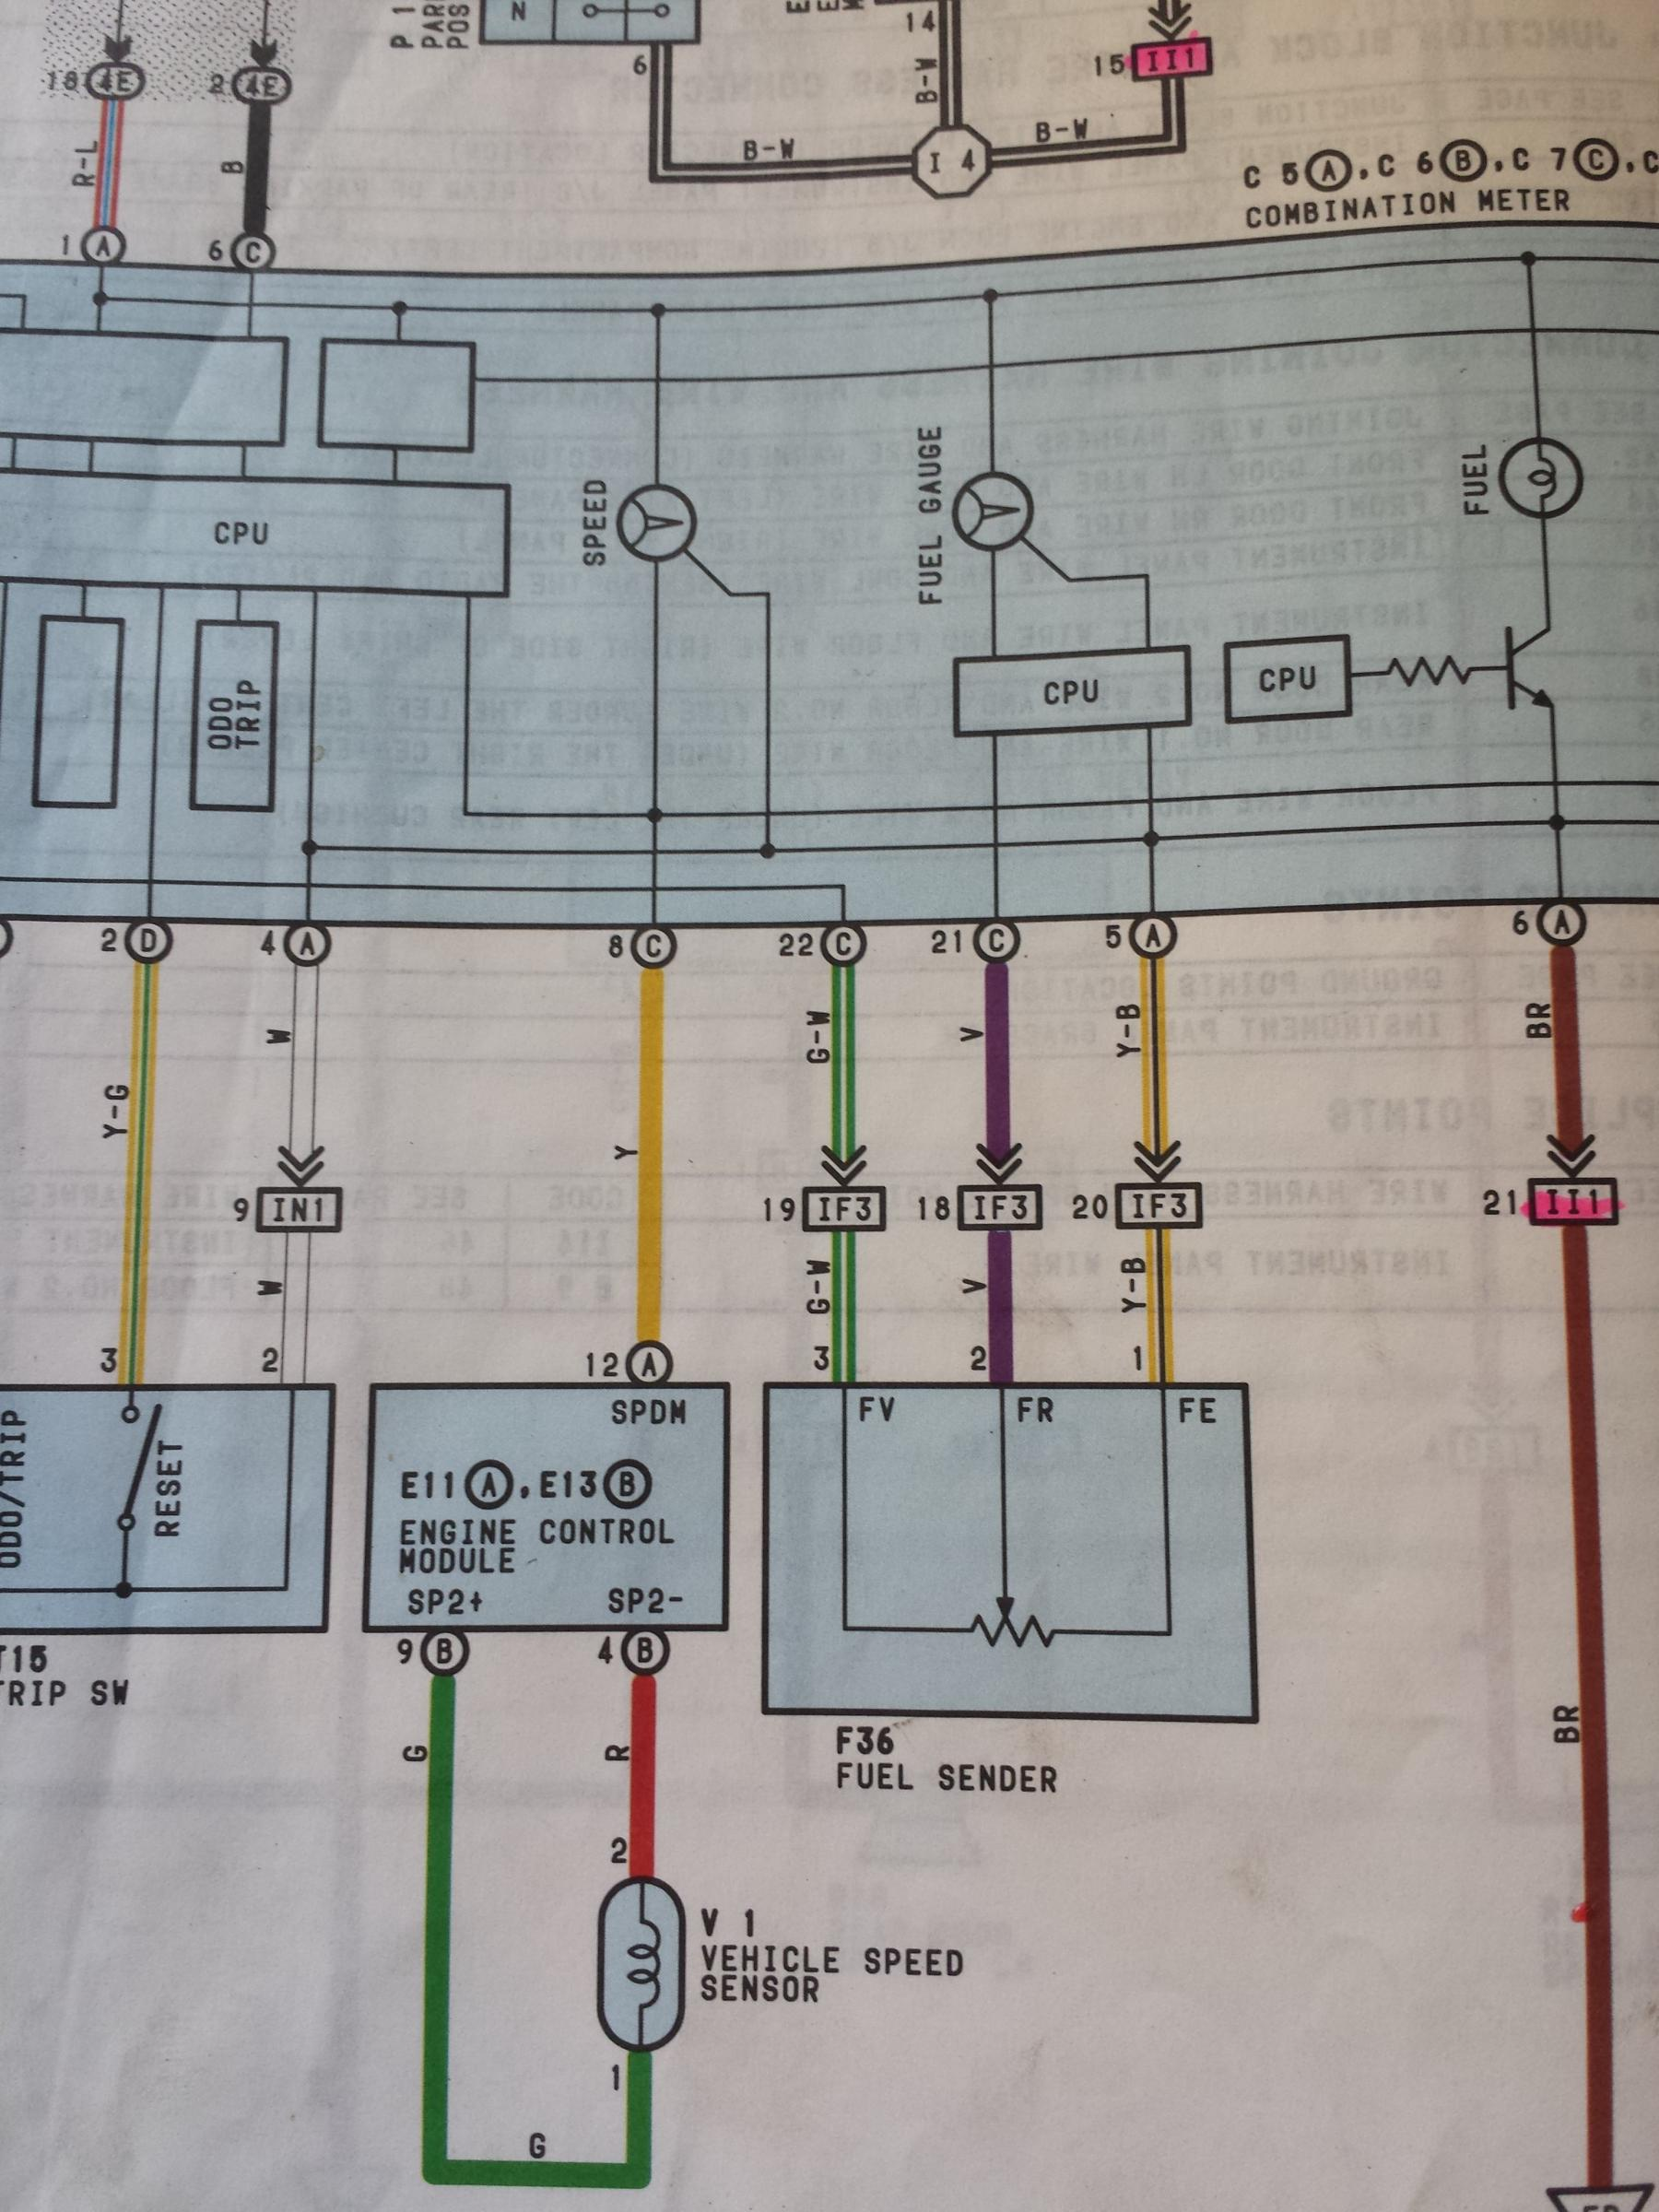 KR_2484] Wiring Diagram For Instrument Cluster For 91 Ls400 Club Lexus  Forums Schematic WiringNect Xrenket Dict Oxyt Lexor Caba Sheox Coun Cosm Isra Mohammedshrine  Librar Wiring 101